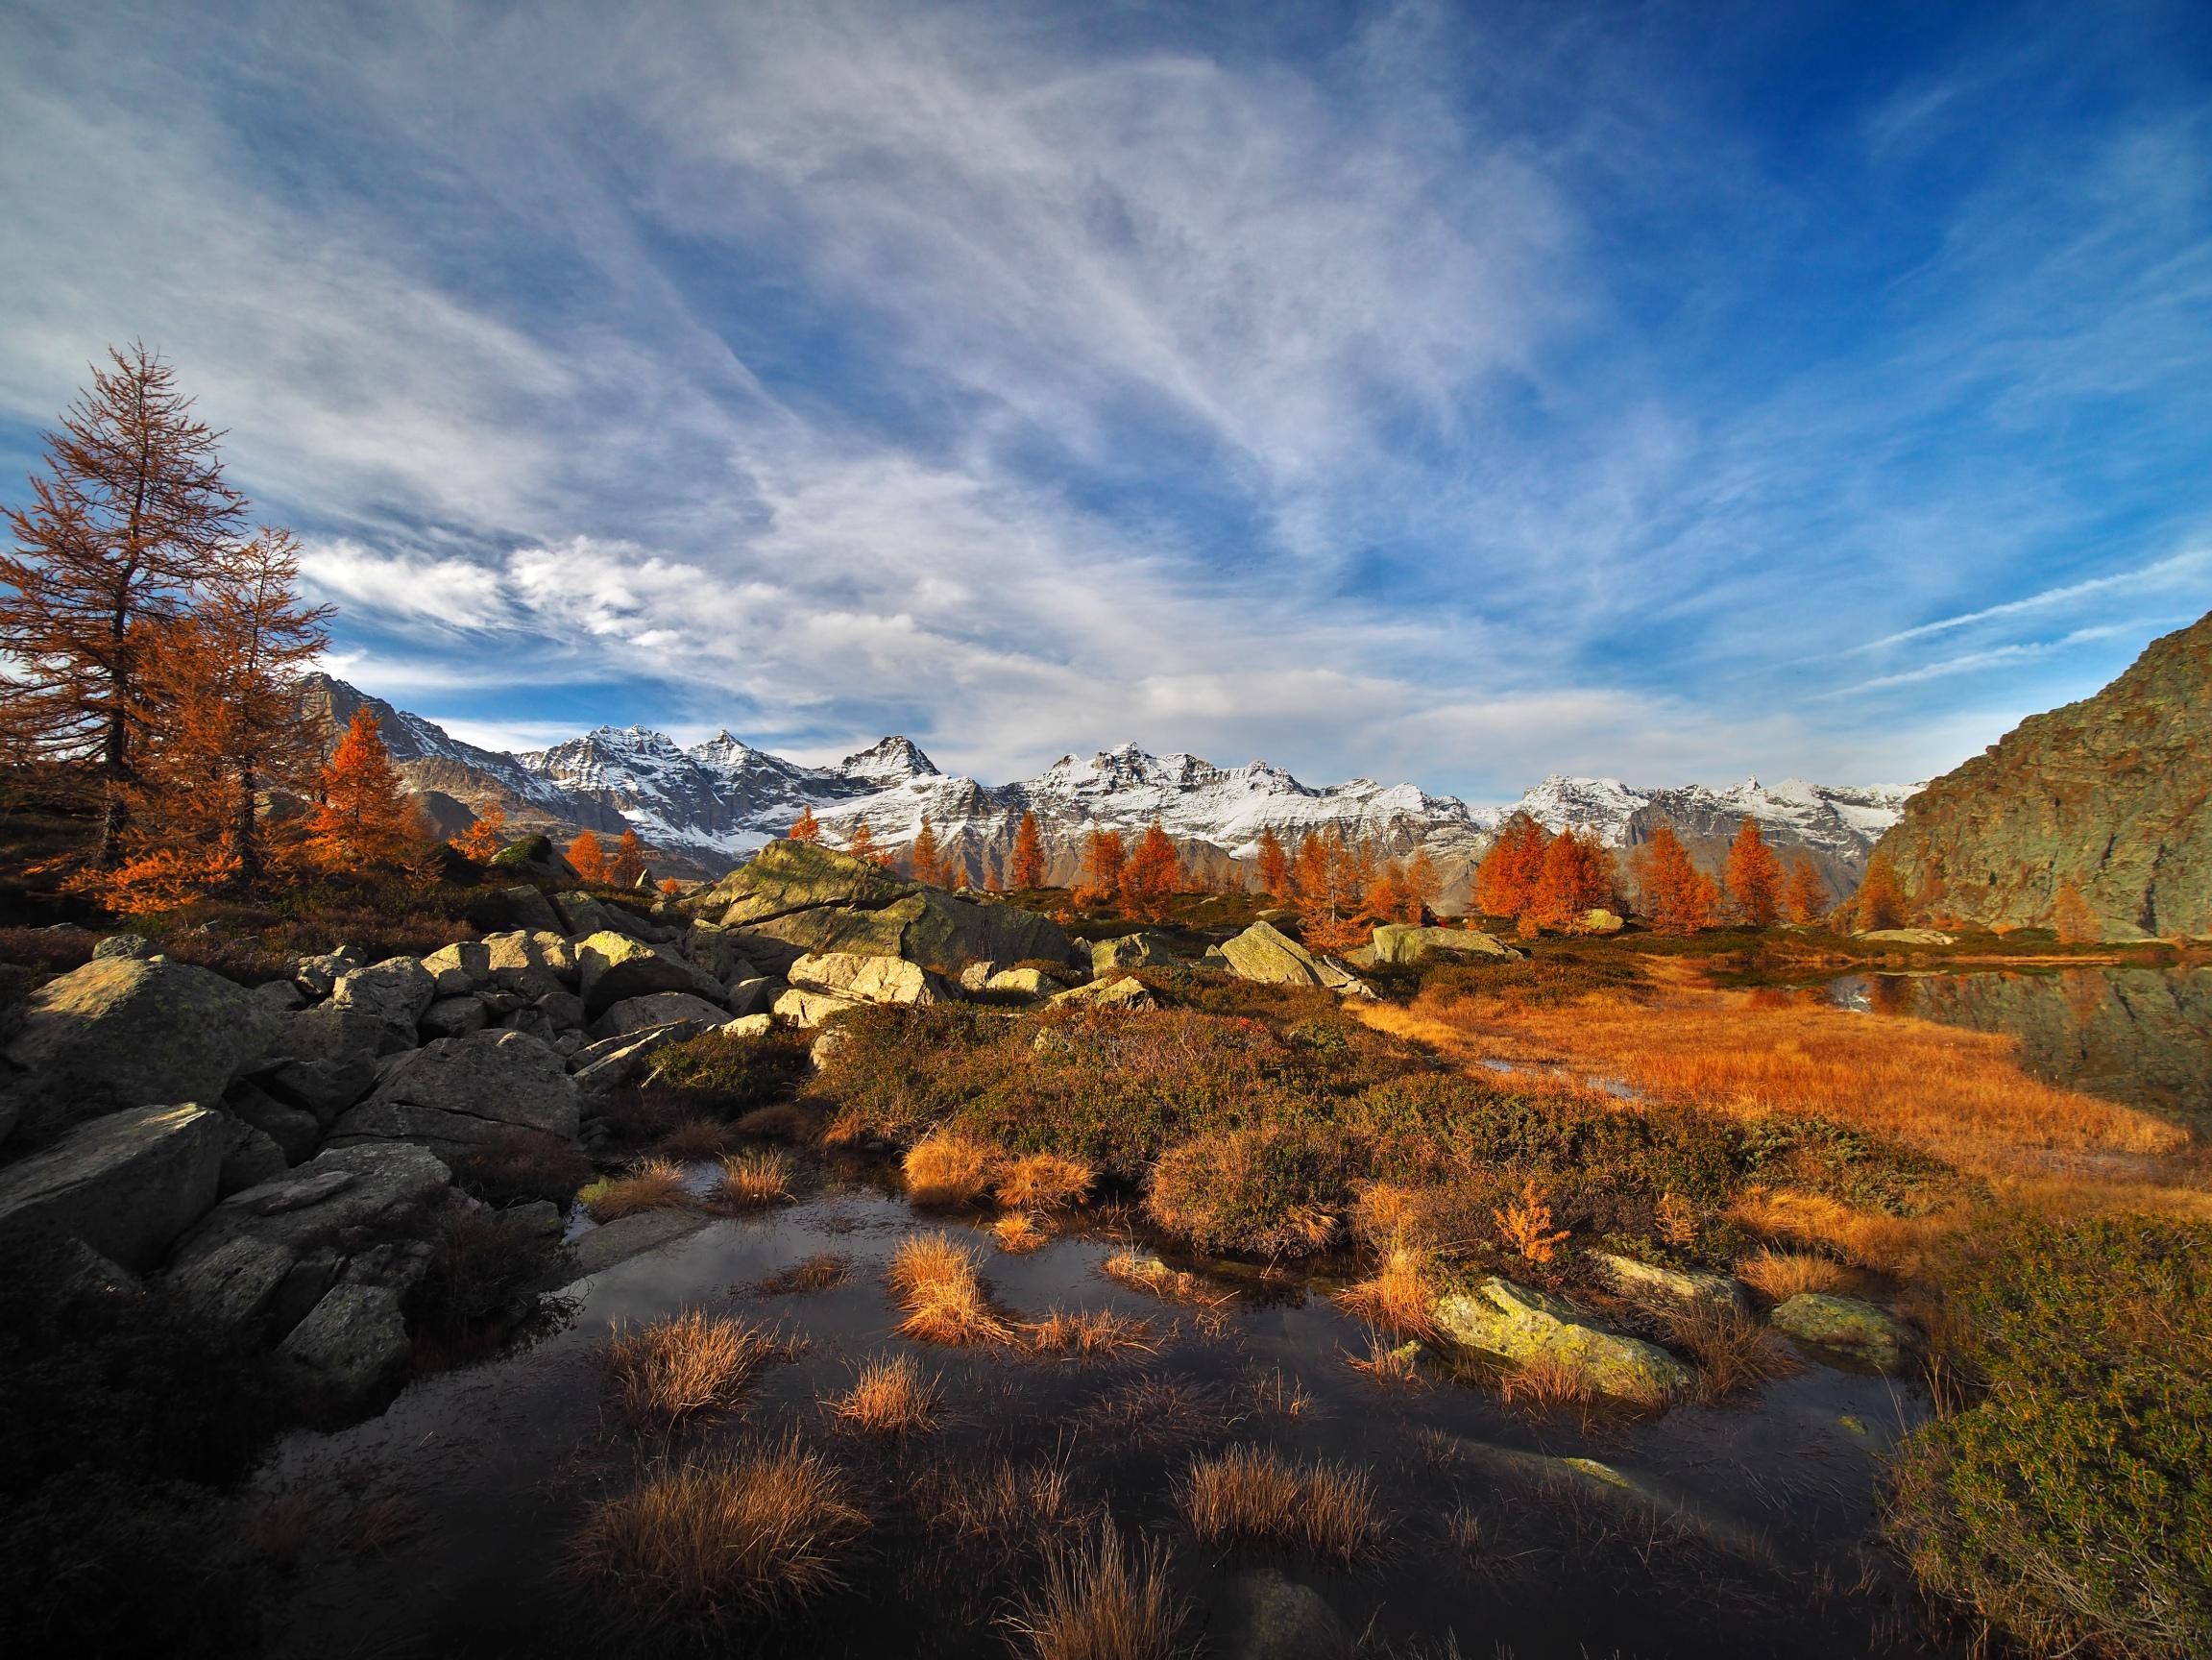 Autumn palette at altitude...